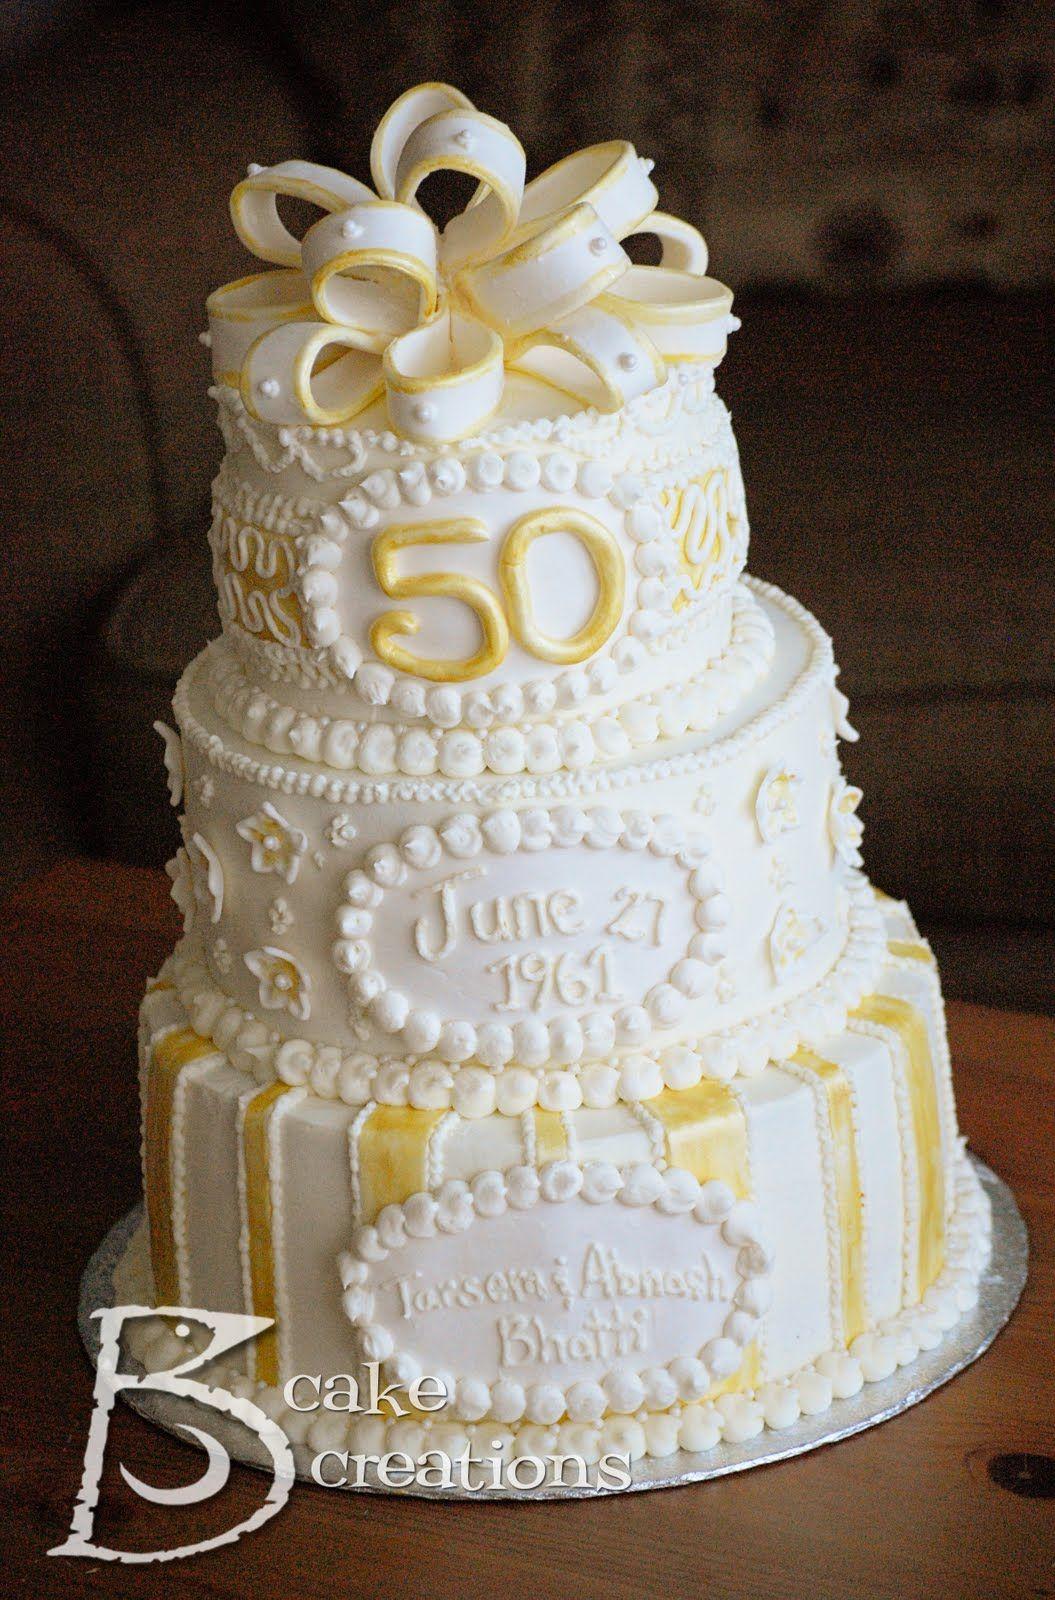 Creations Cake Decorating Golden 50th Wedding Anniversary